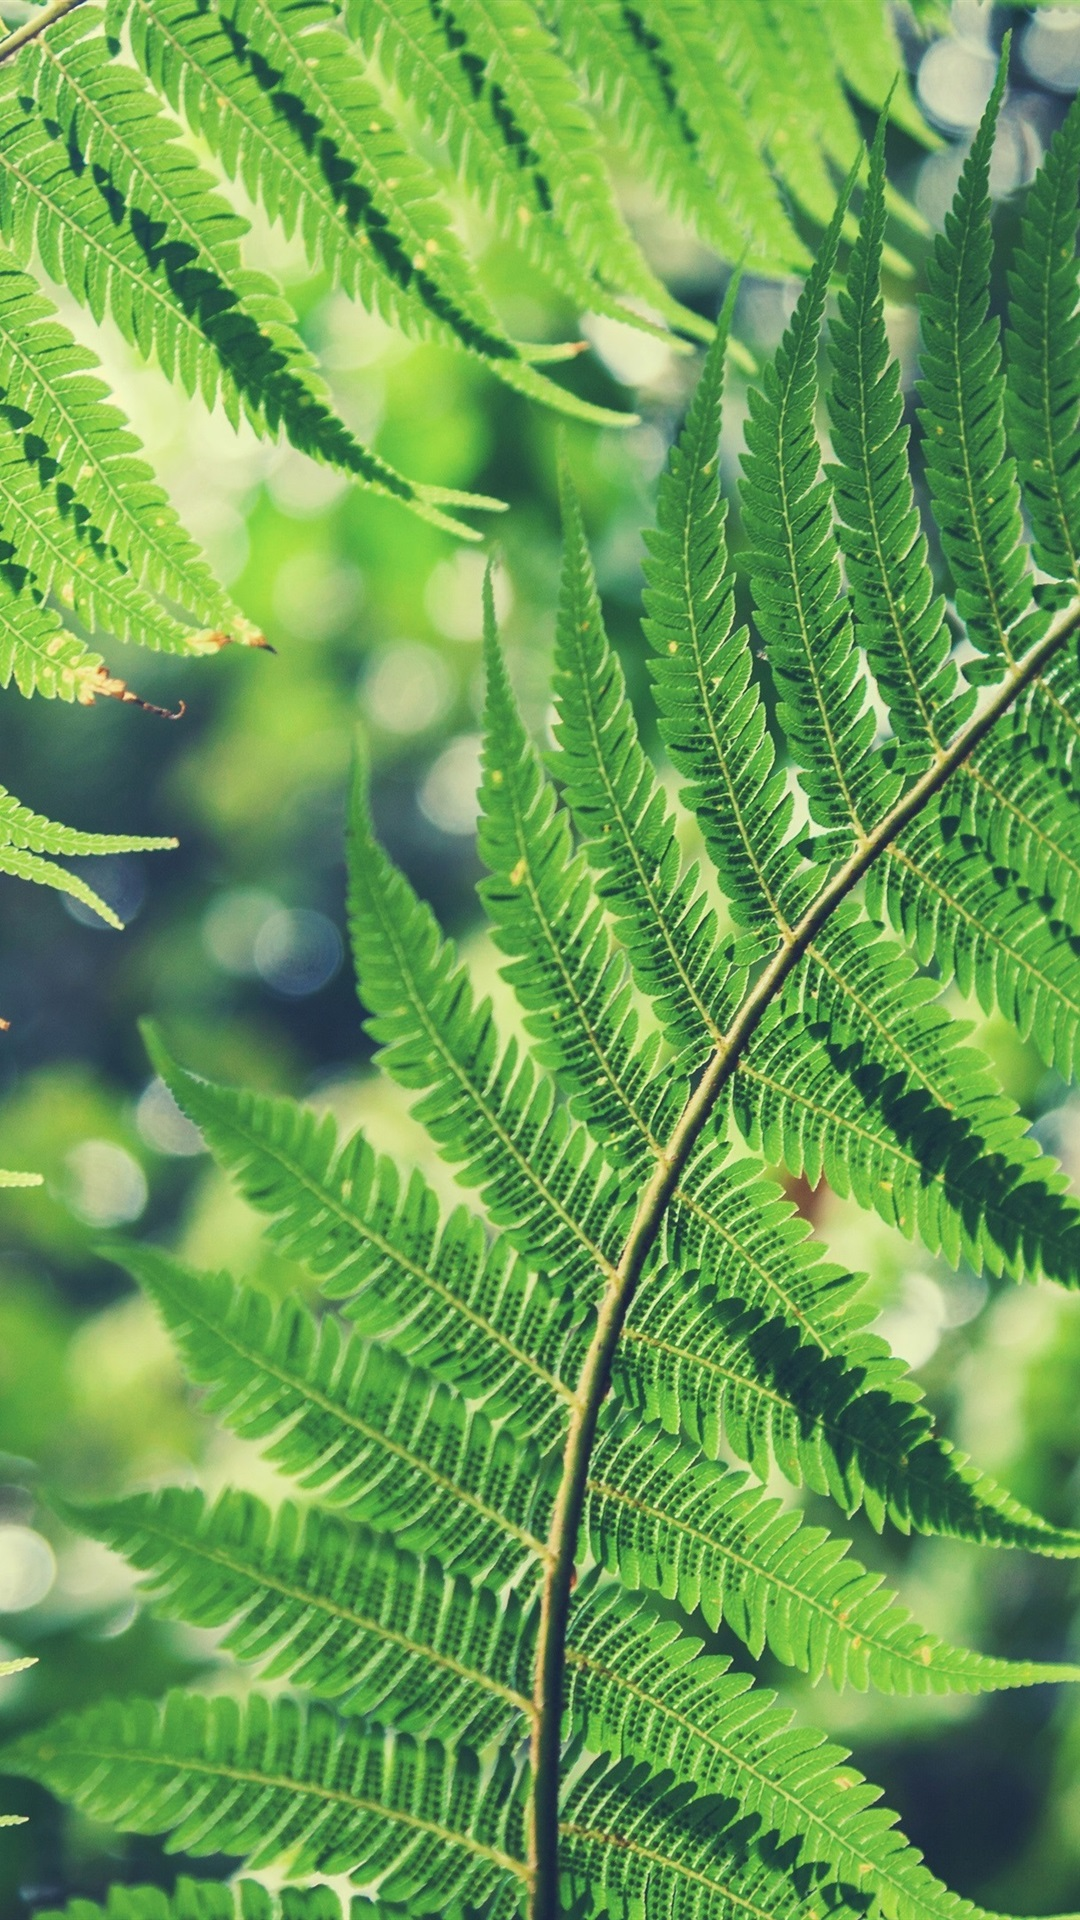 Green Fern Leaves 1080x1920 Iphone 8 7 6 6s Plus Wallpaper